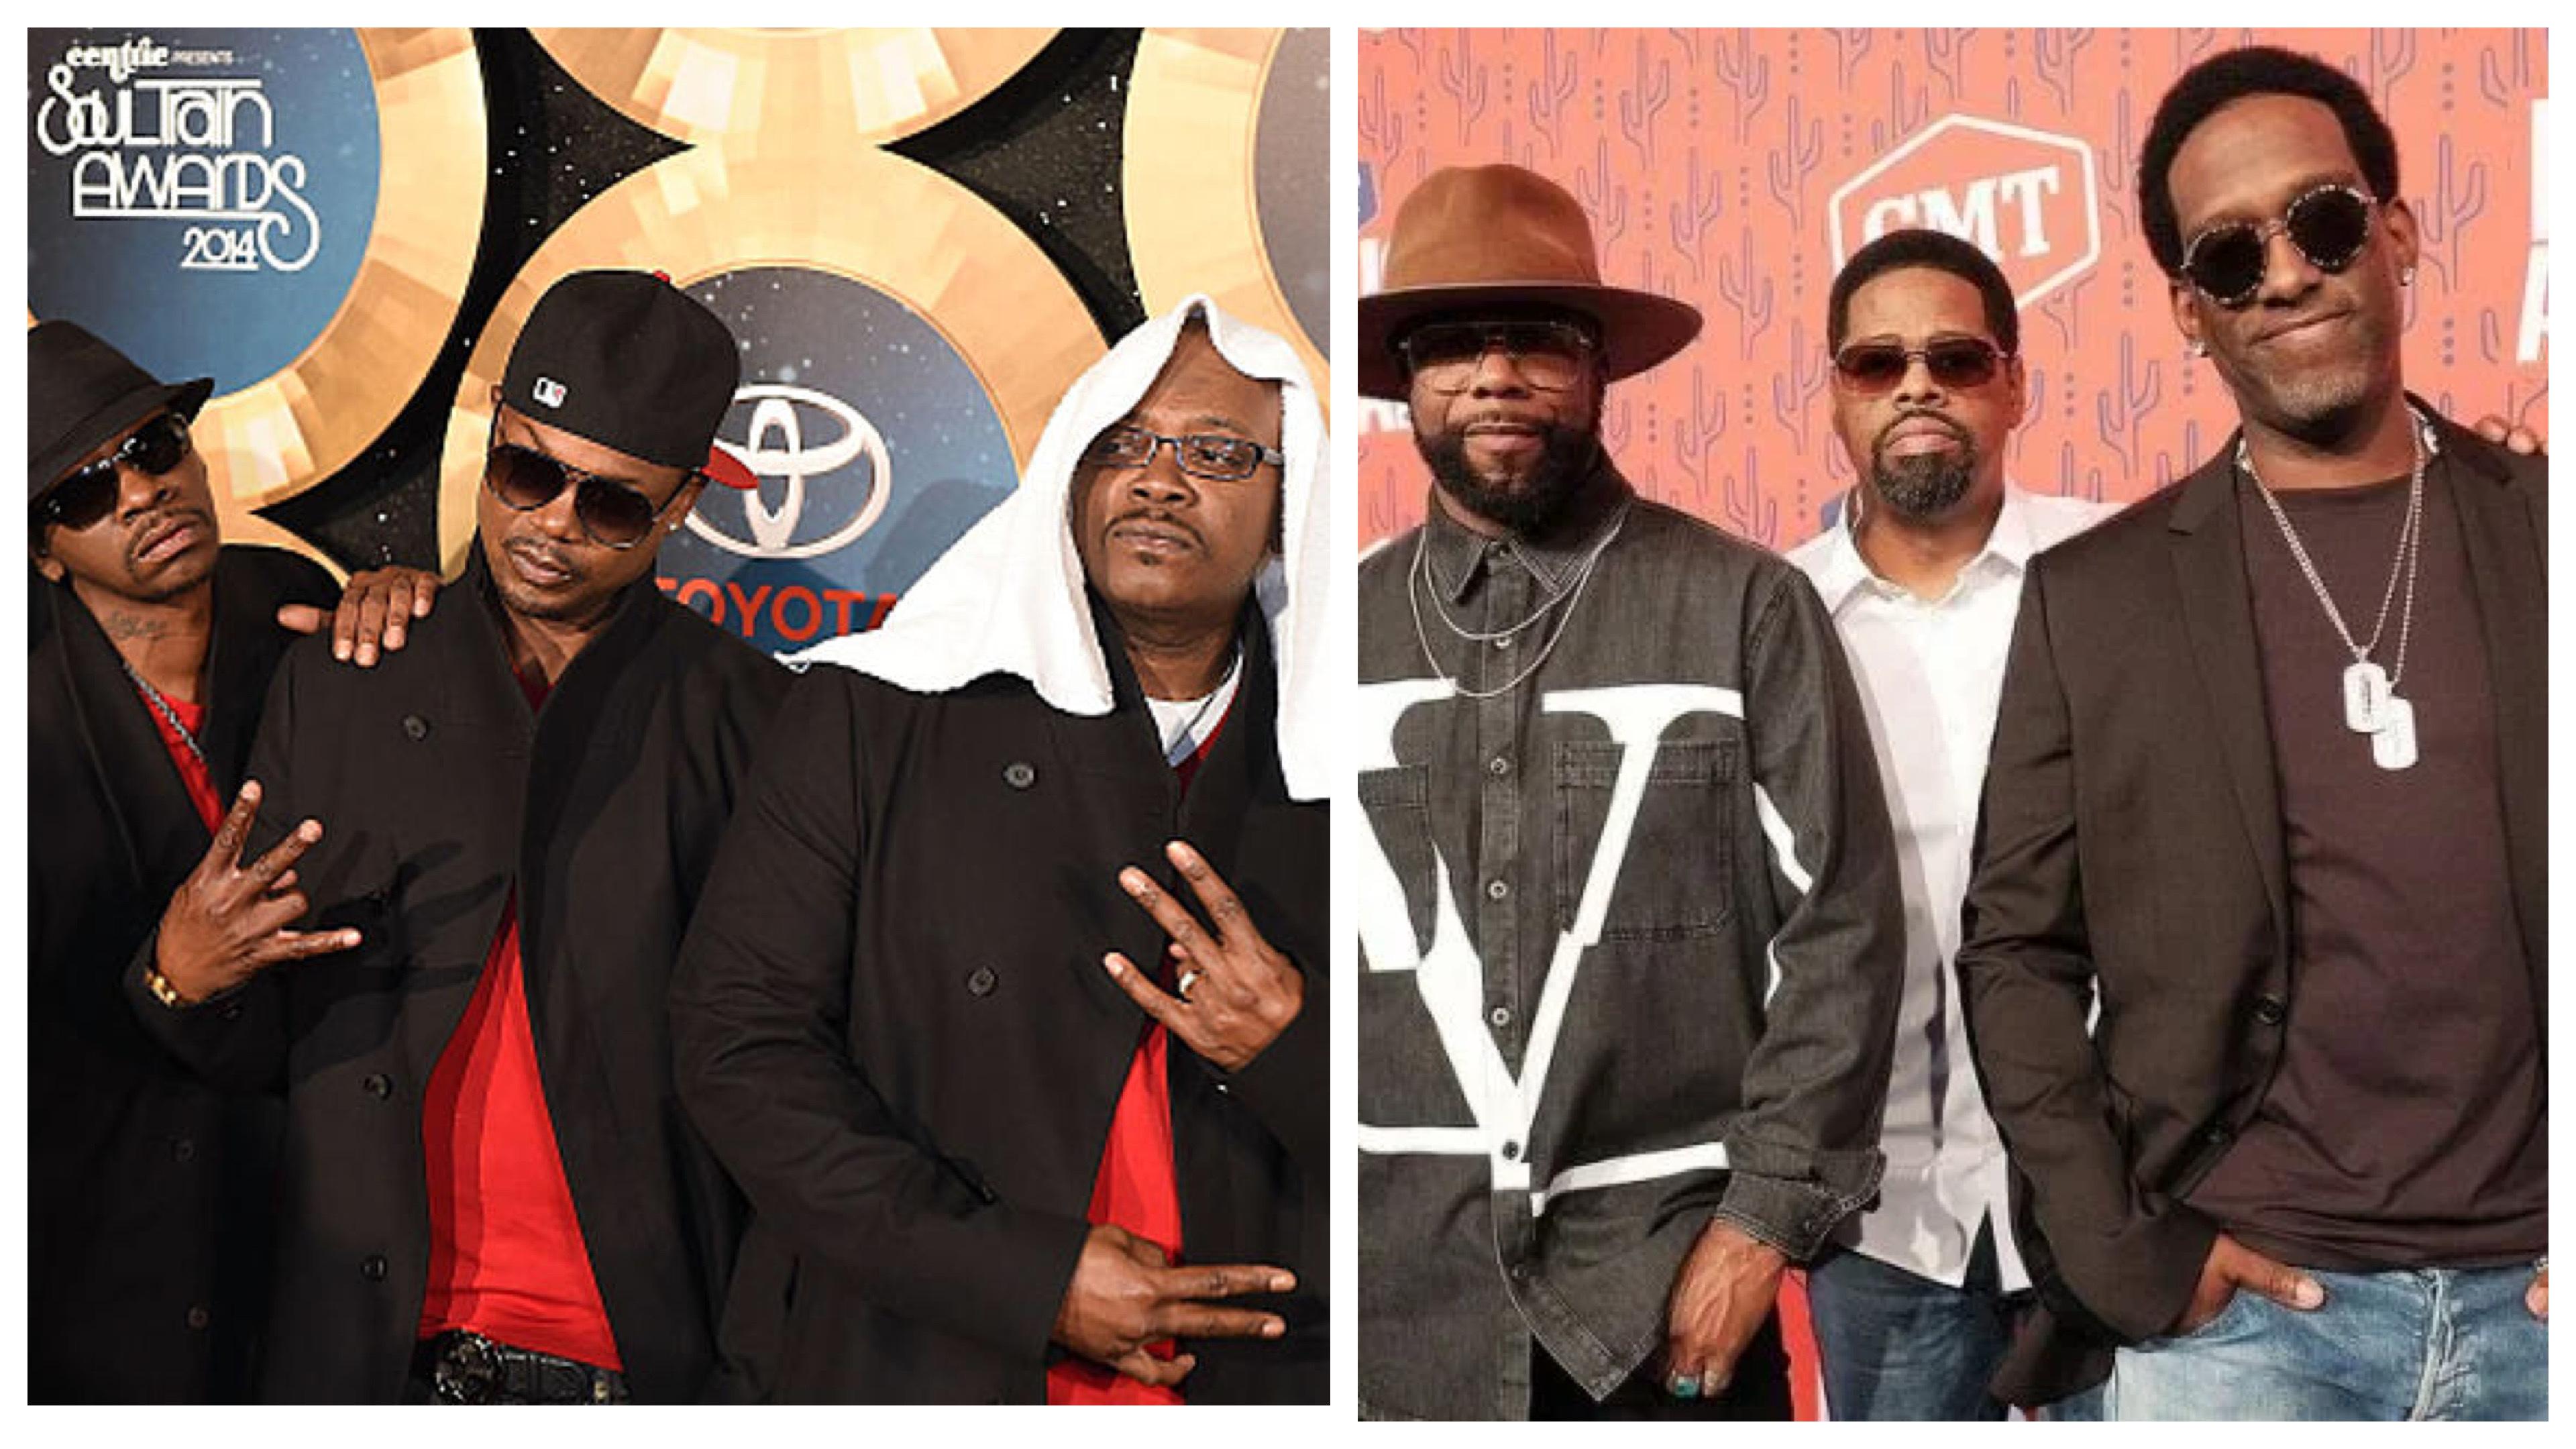 Jodeci and Boyz II Men